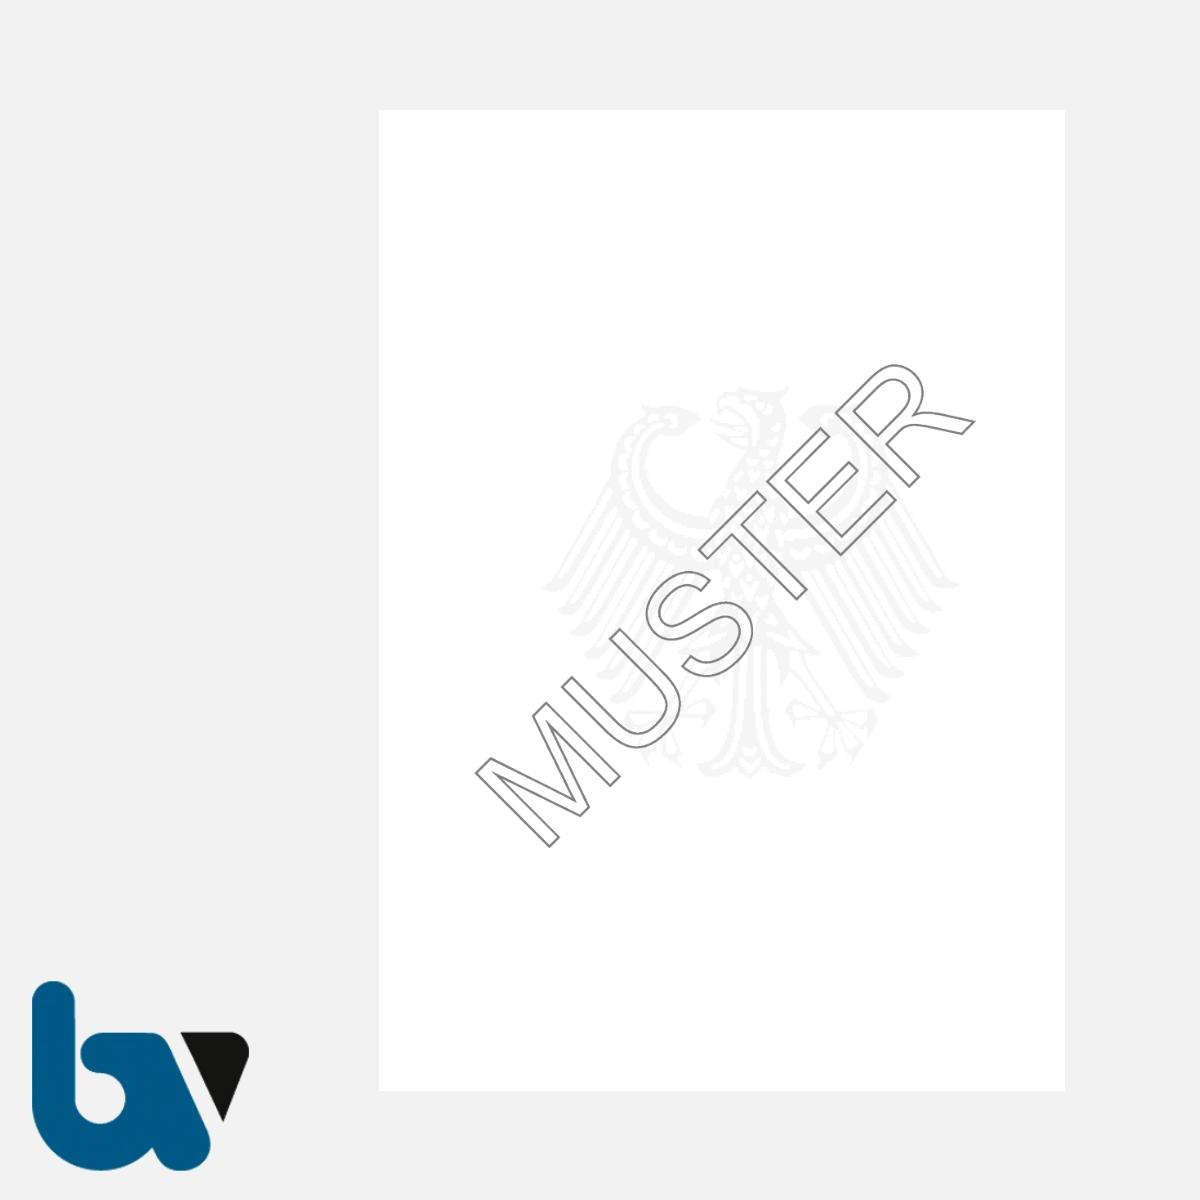 0/168-8ub Urkundenpapier Standesamt Personenstand Urkunde Register Dokument ungelocht Bundesadler 100gr Stammbuch Format 130 200 | Borgard Verlag GmbH